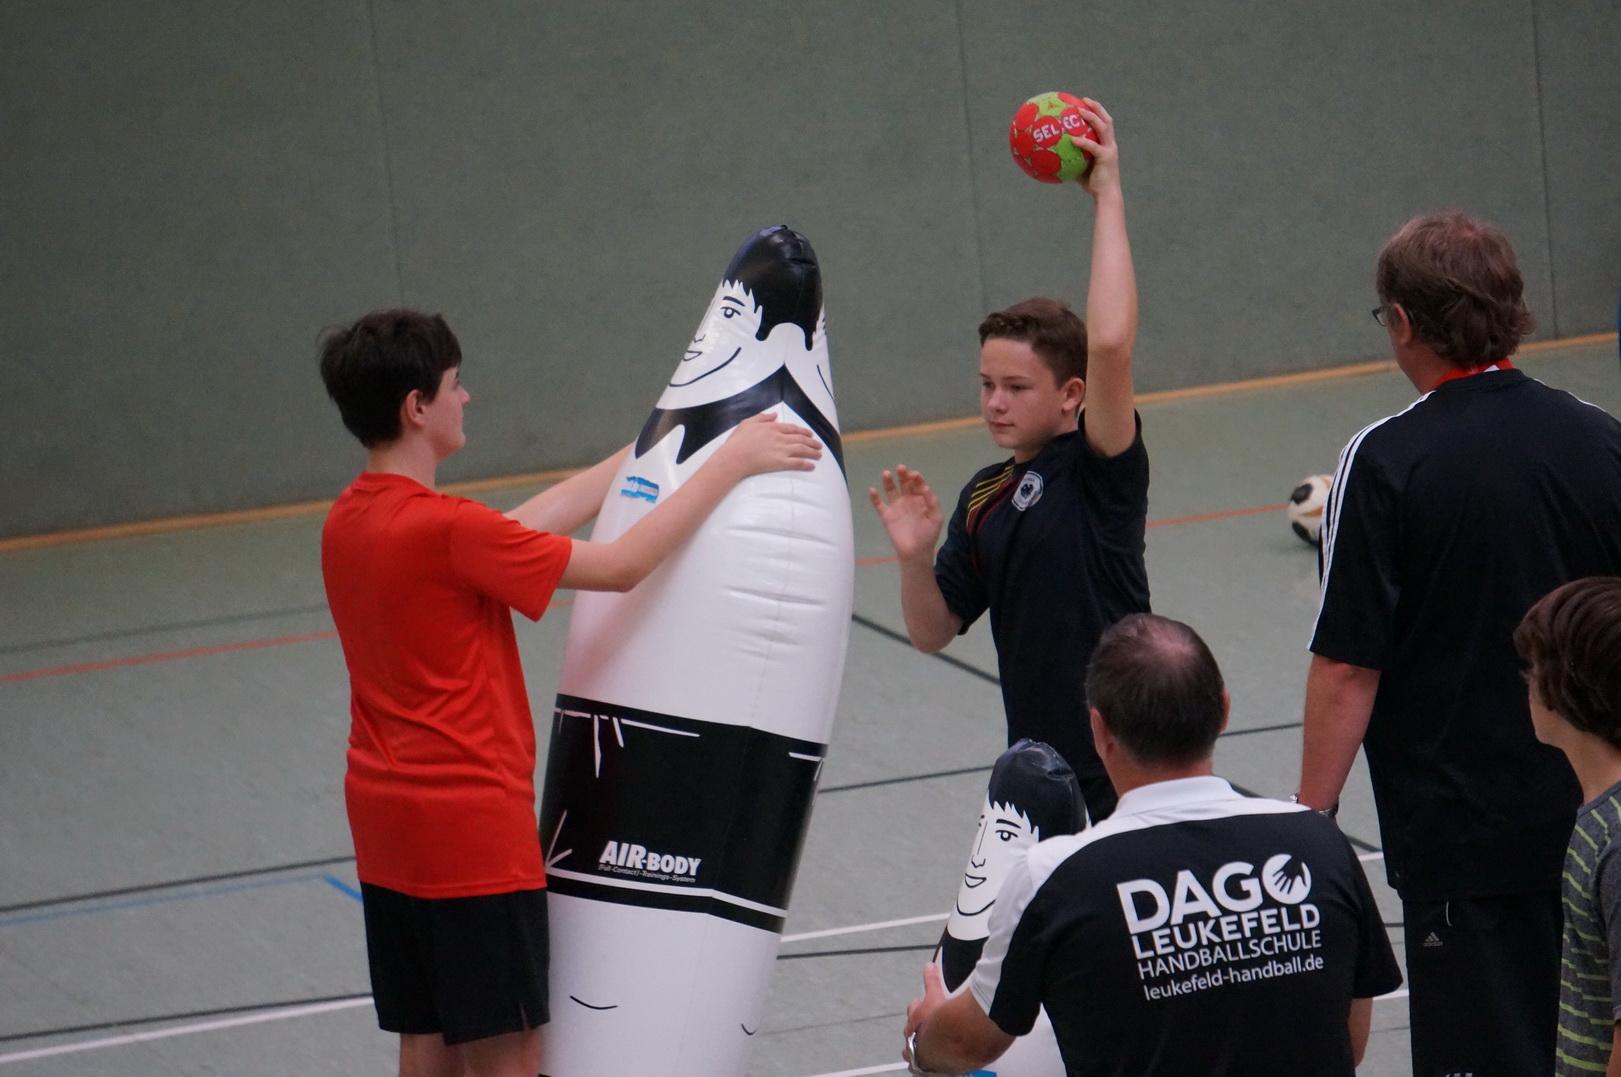 201808_Handballcamp_SDH_MG_237w